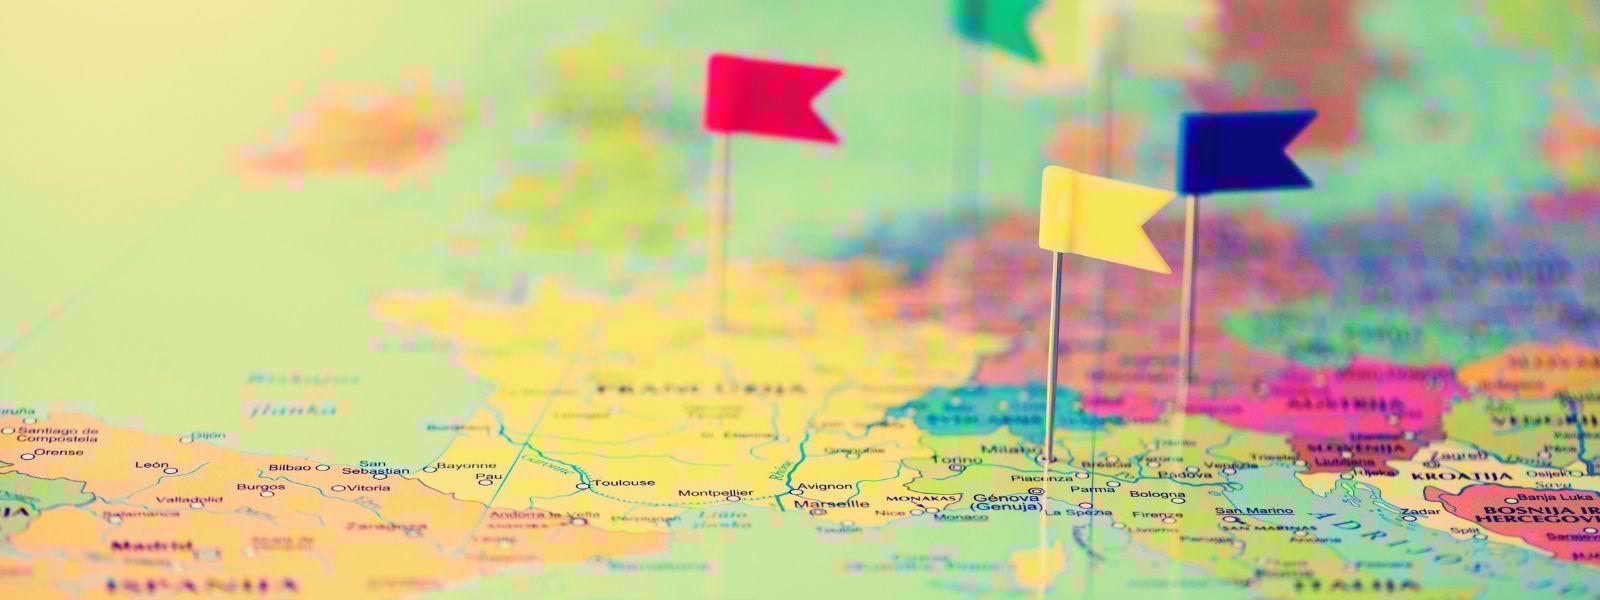 7 European Destinations We Love